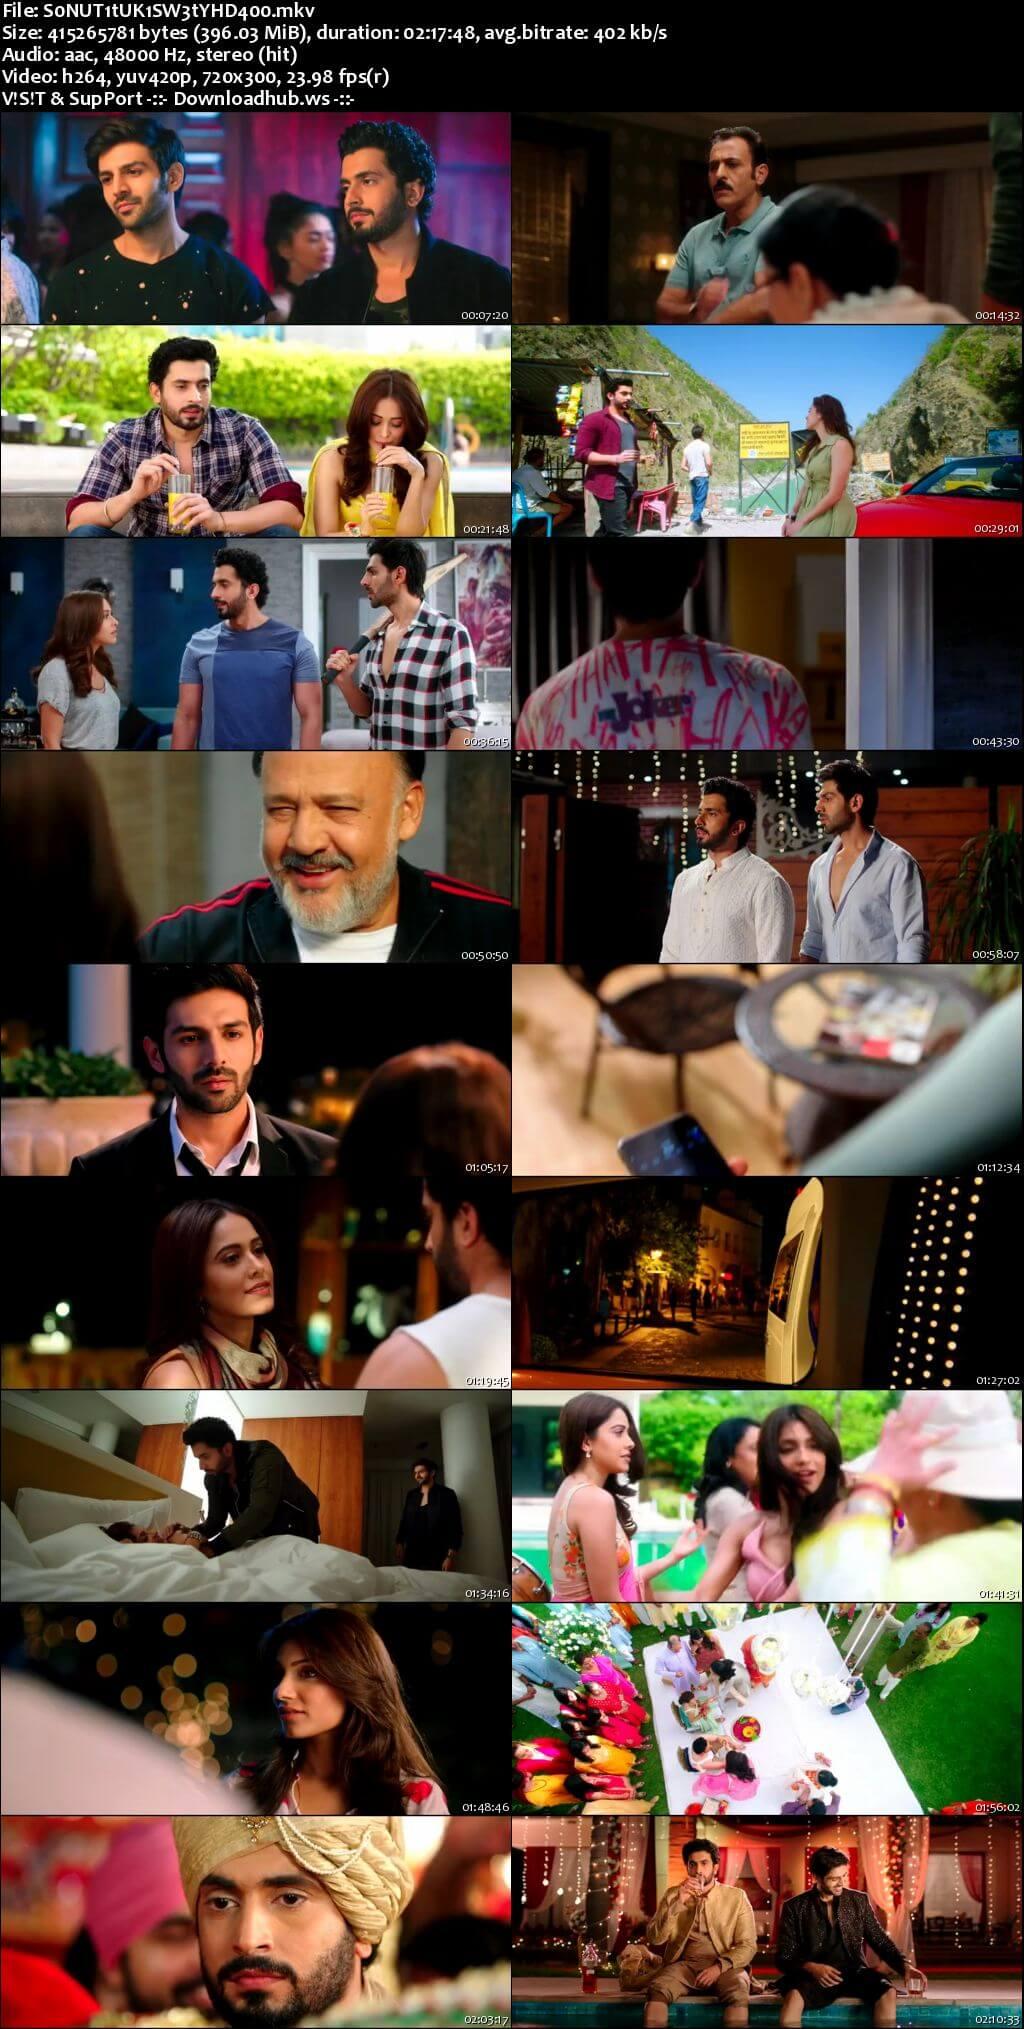 Sonu Ke Titu Ki Sweety 2018 Hindi 400MB HDRip 480p ESubs ... Pacific Rim 2013 Bluray